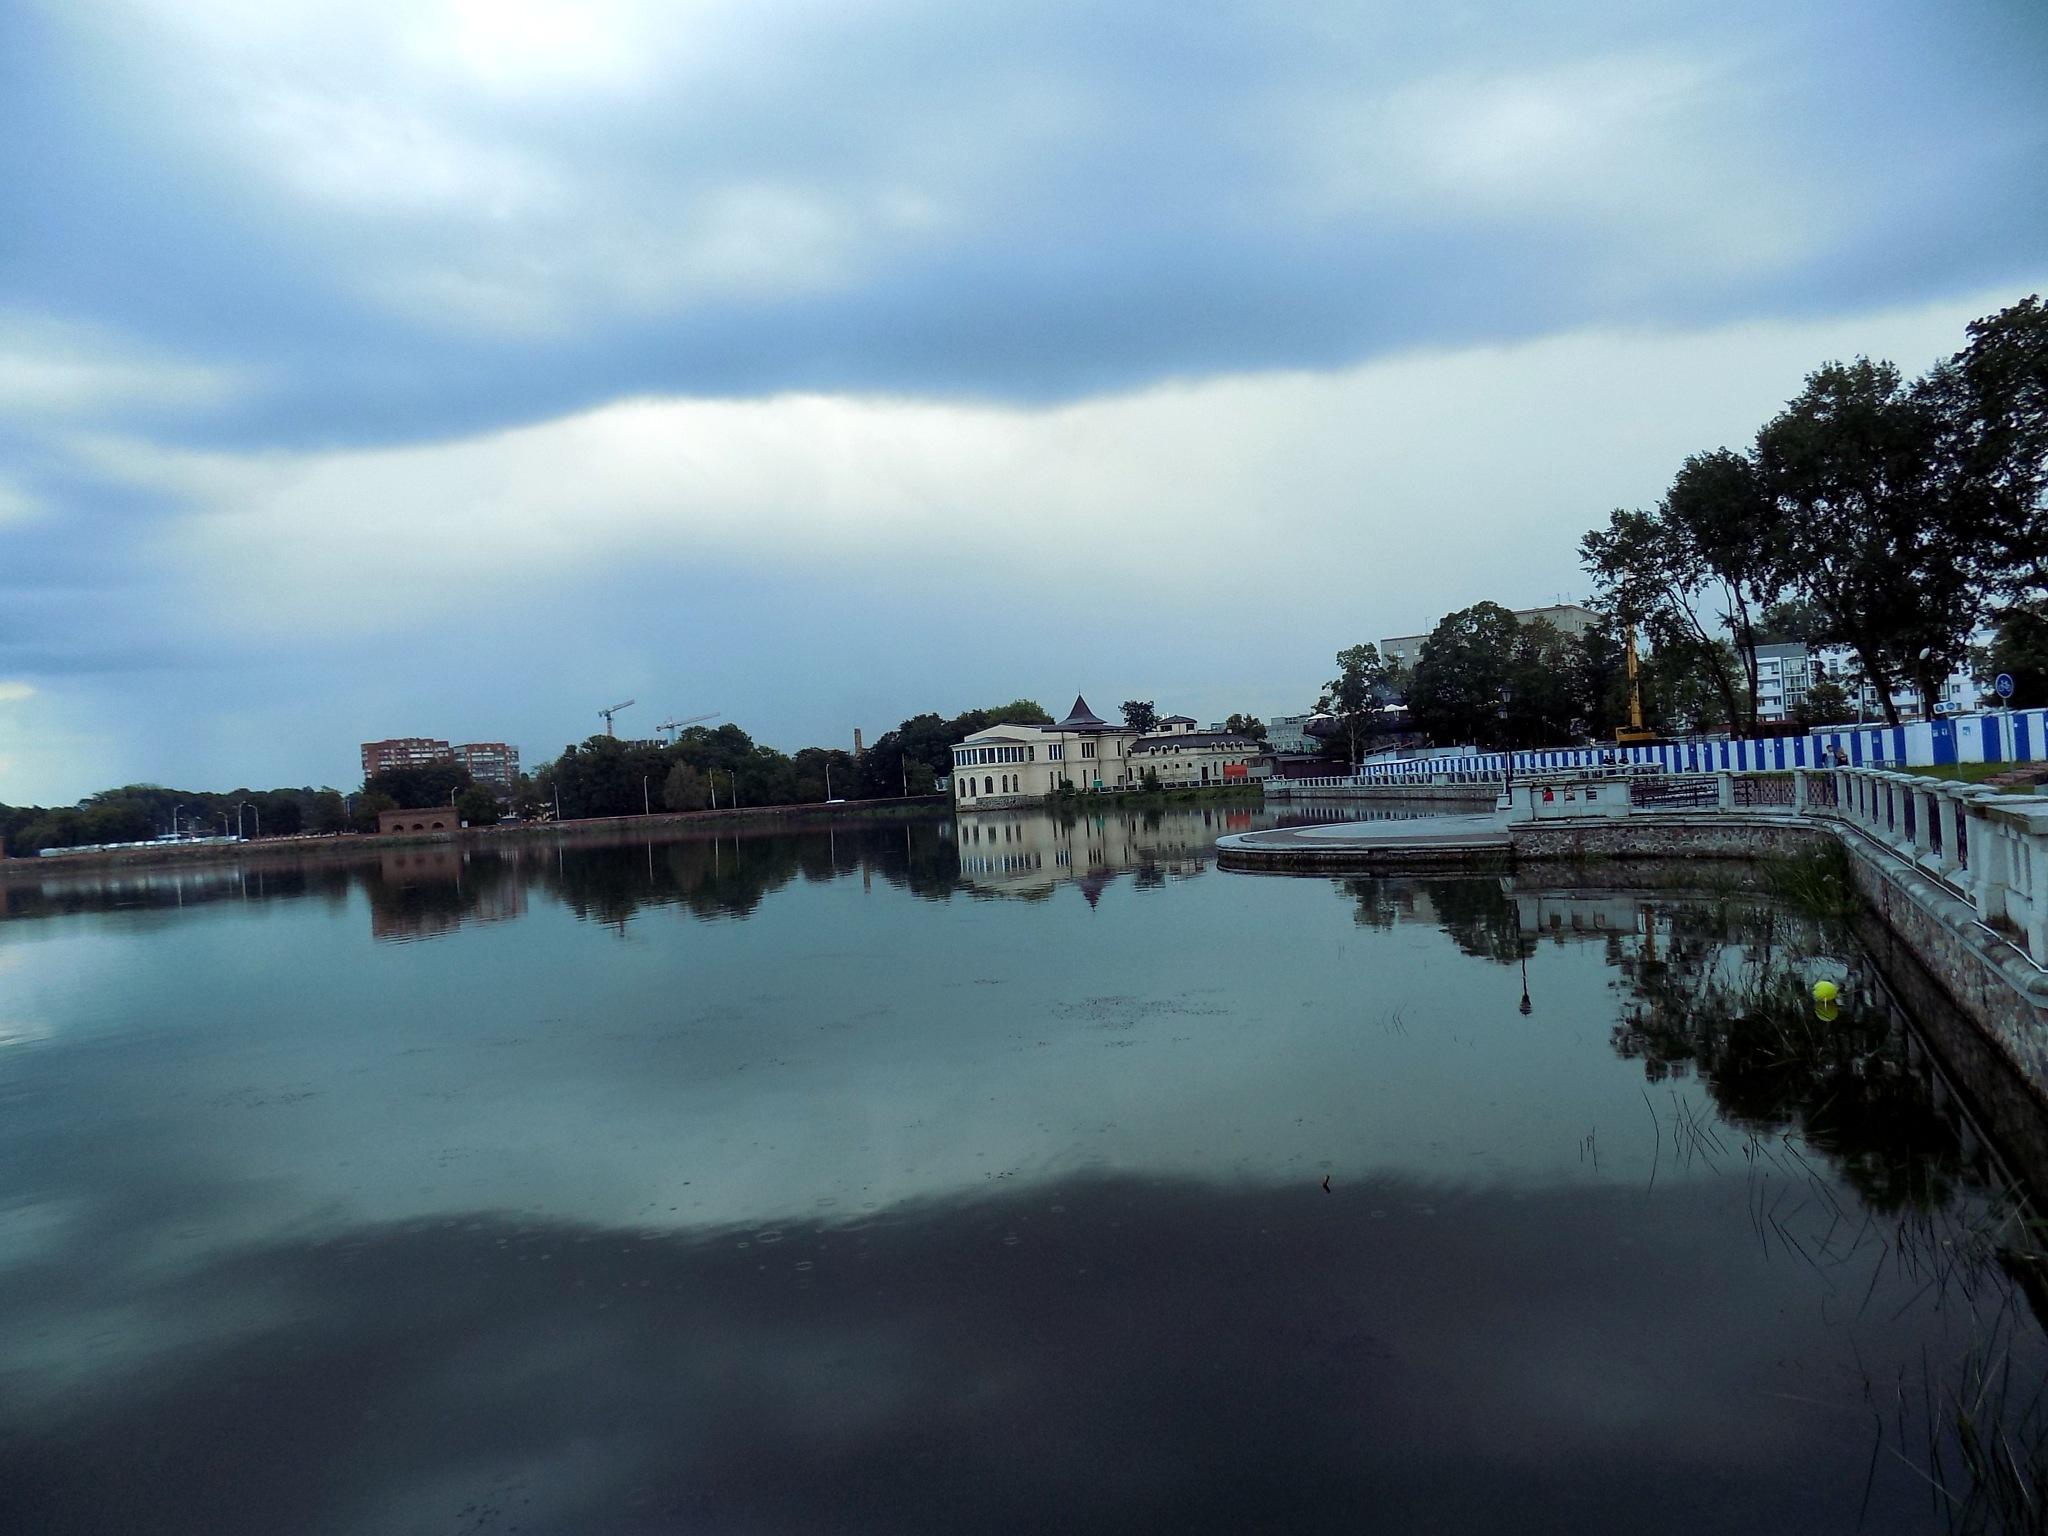 Lake by uzkuraitiene62